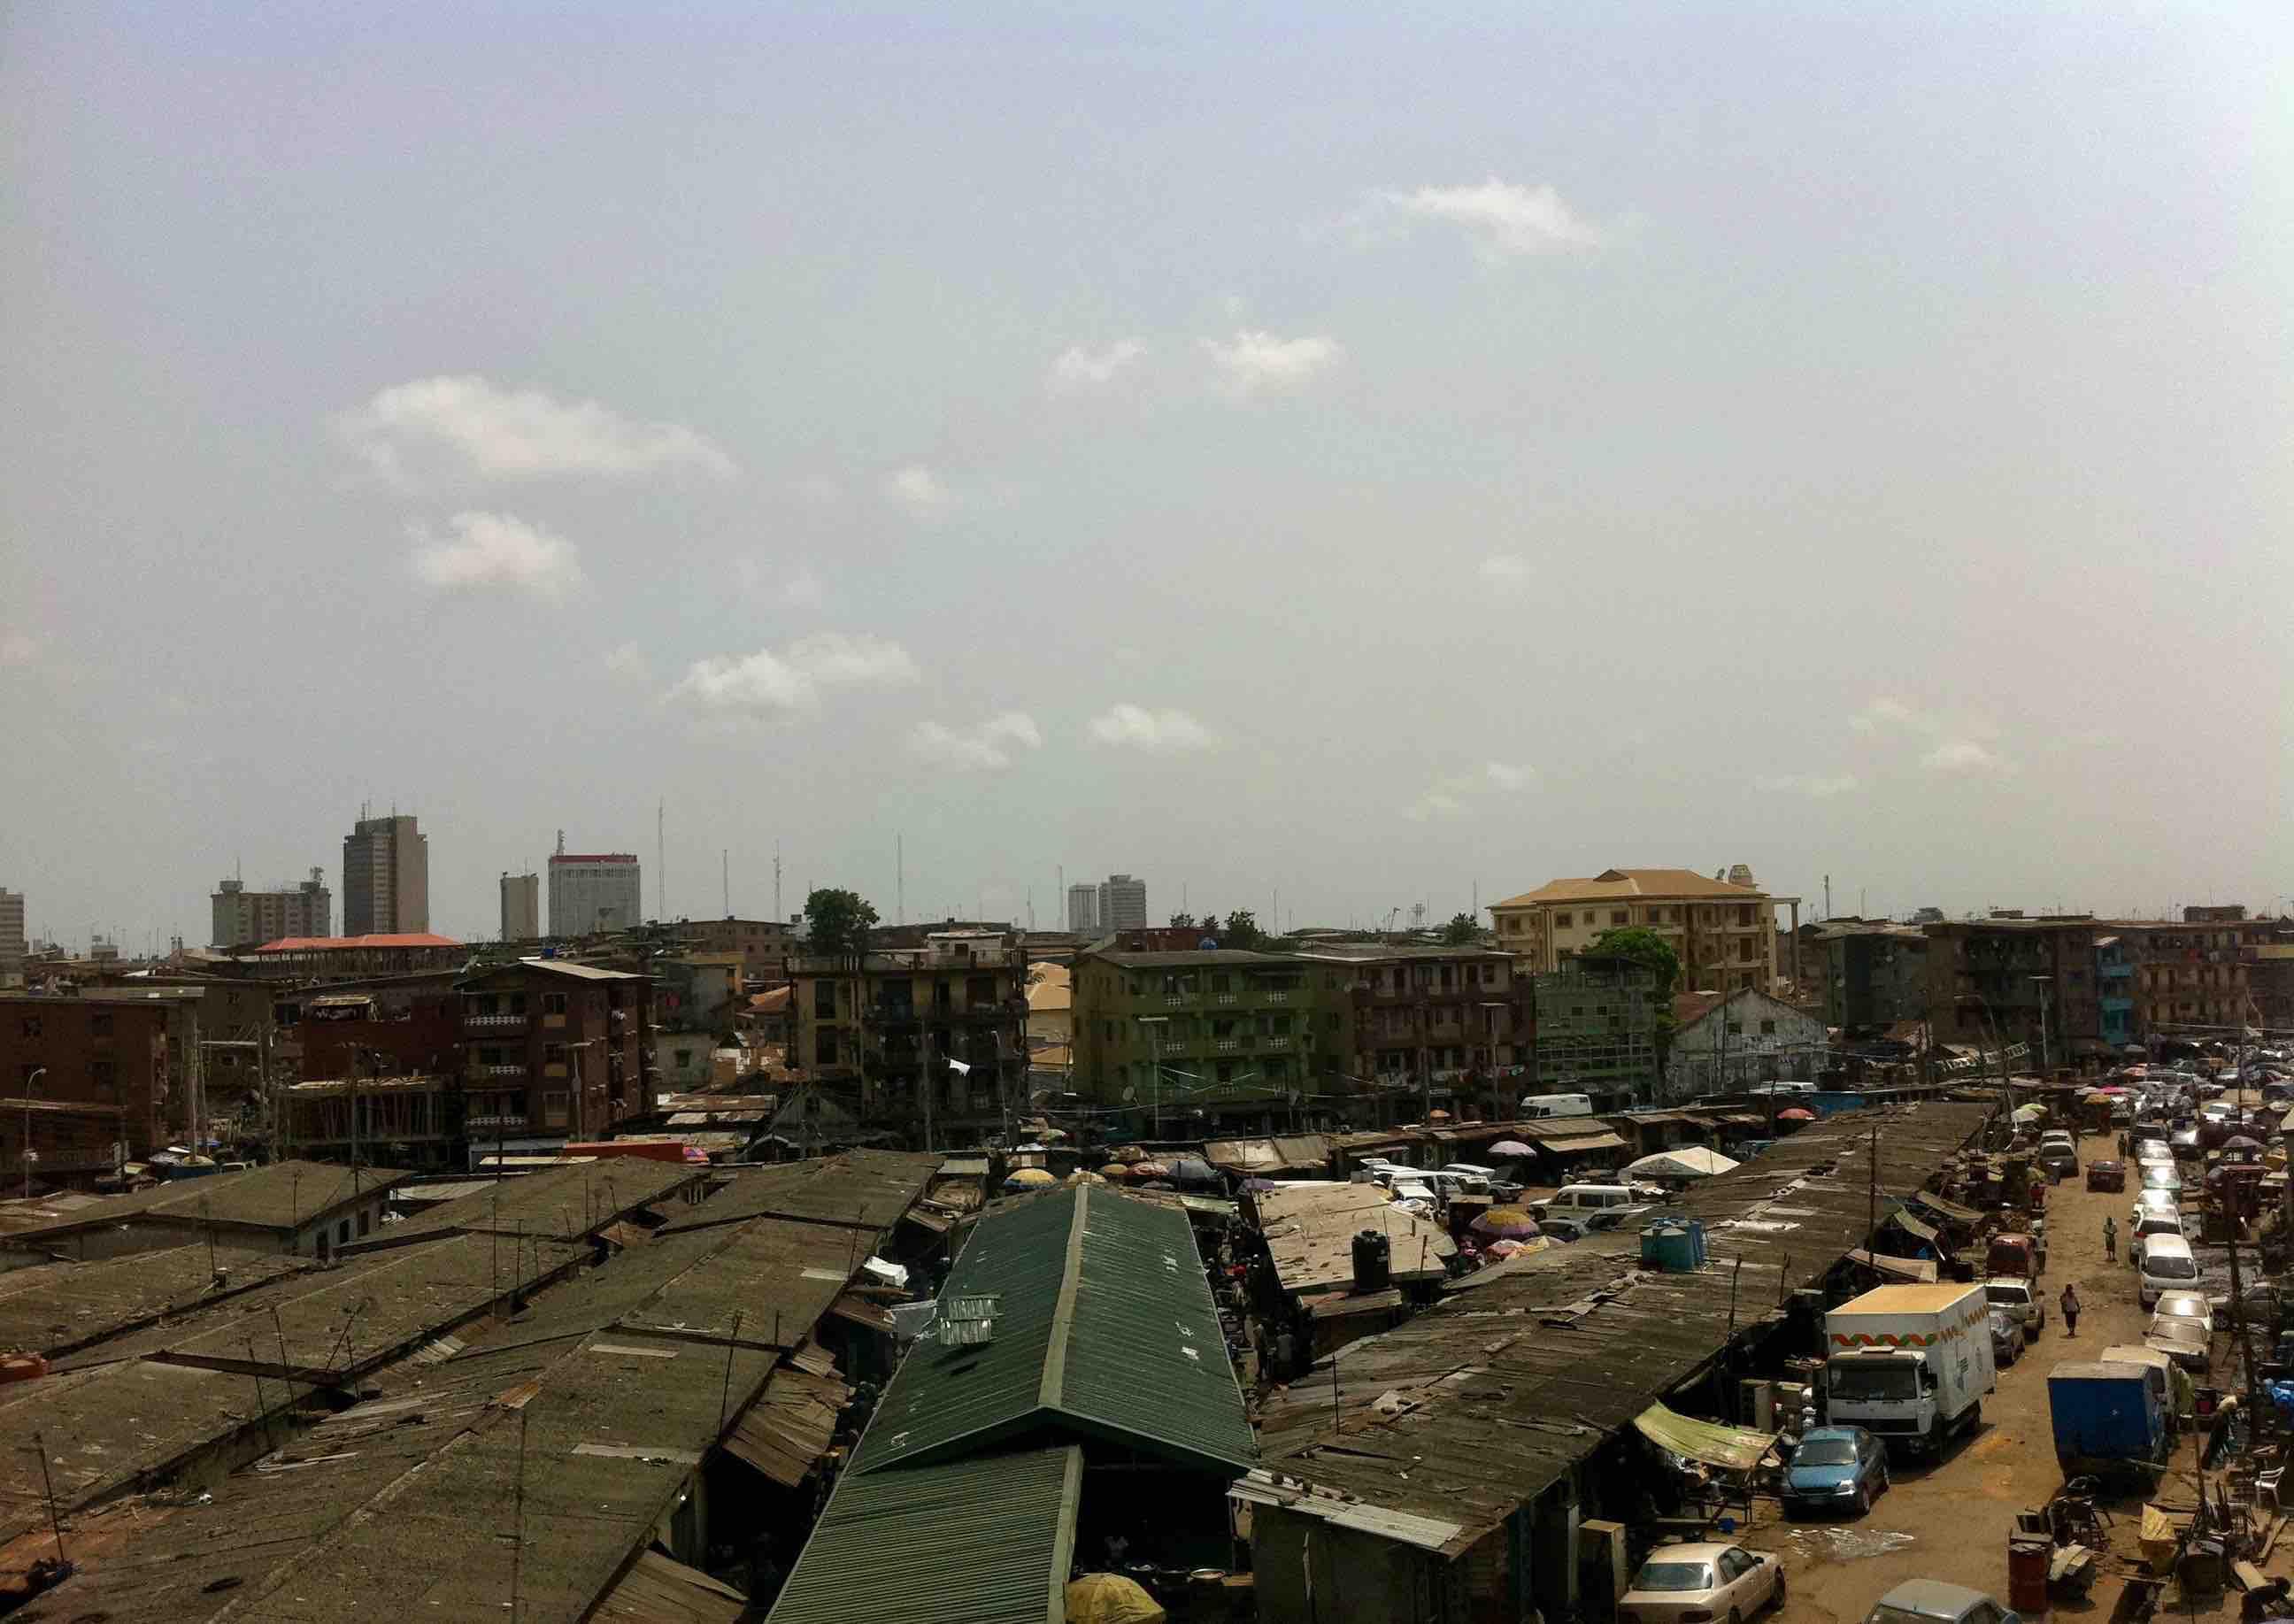 Adeniji Adele, Lagos Island, Nigeria. #JujuFilms